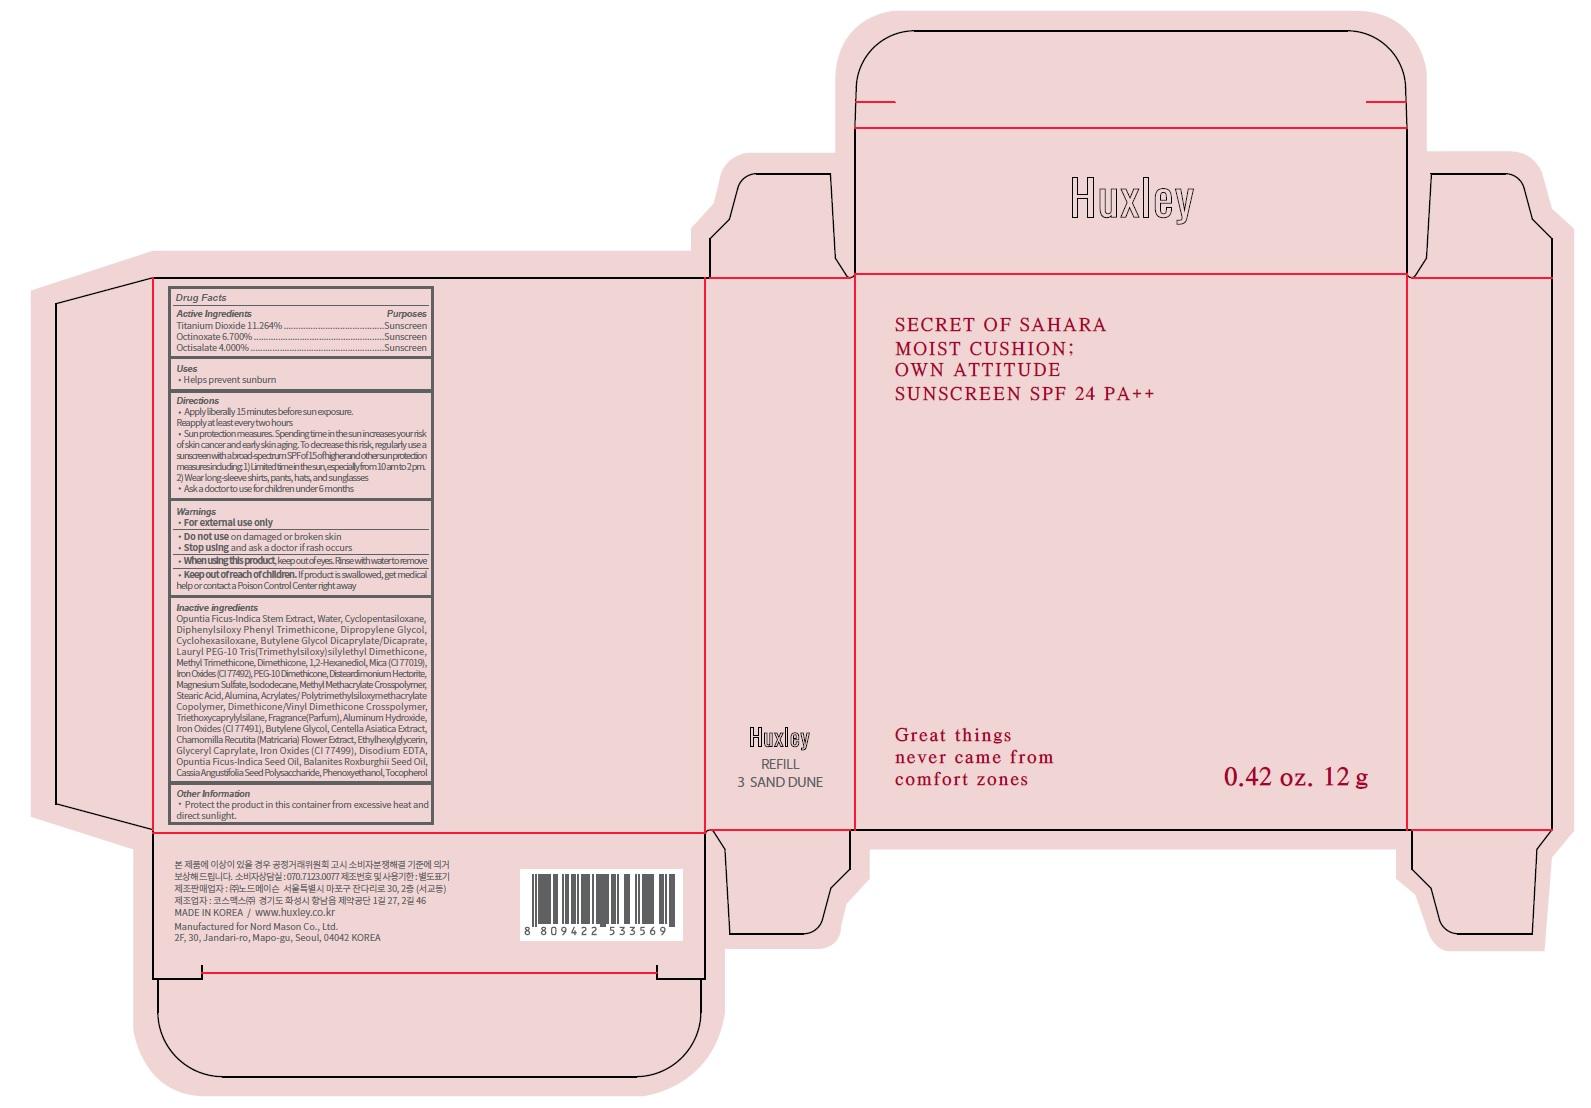 Is Huxley Moist Cushion Own Attitude 3 Sand Dune | Titanium Dioxide, Octinoxate, Octisalate Cream safe while breastfeeding